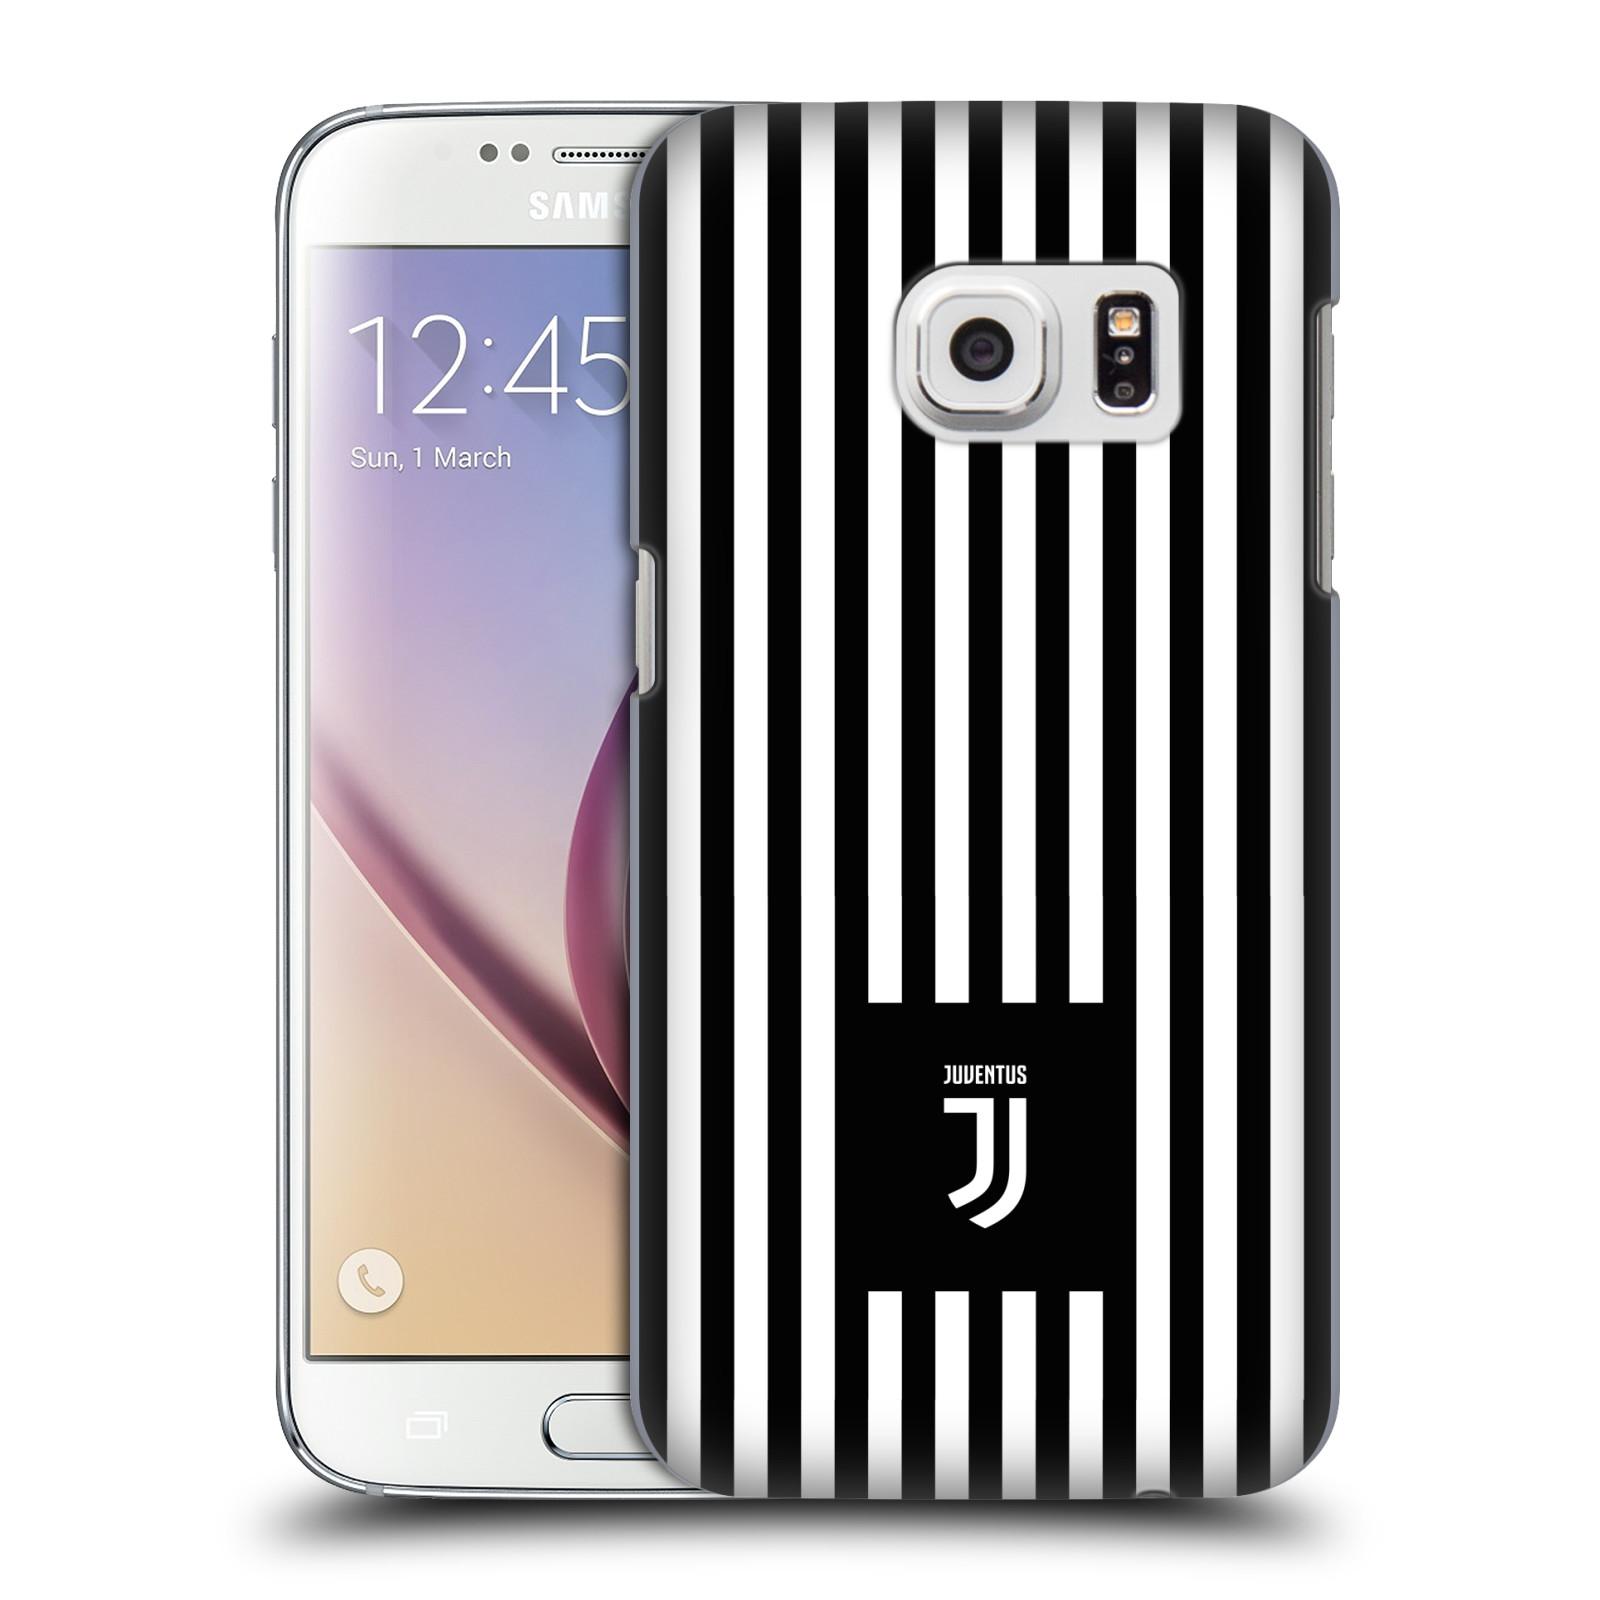 Plastové pouzdro na mobil Samsung Galaxy S7 - Head Case - Juventus FC - Nové logo - Pruhy